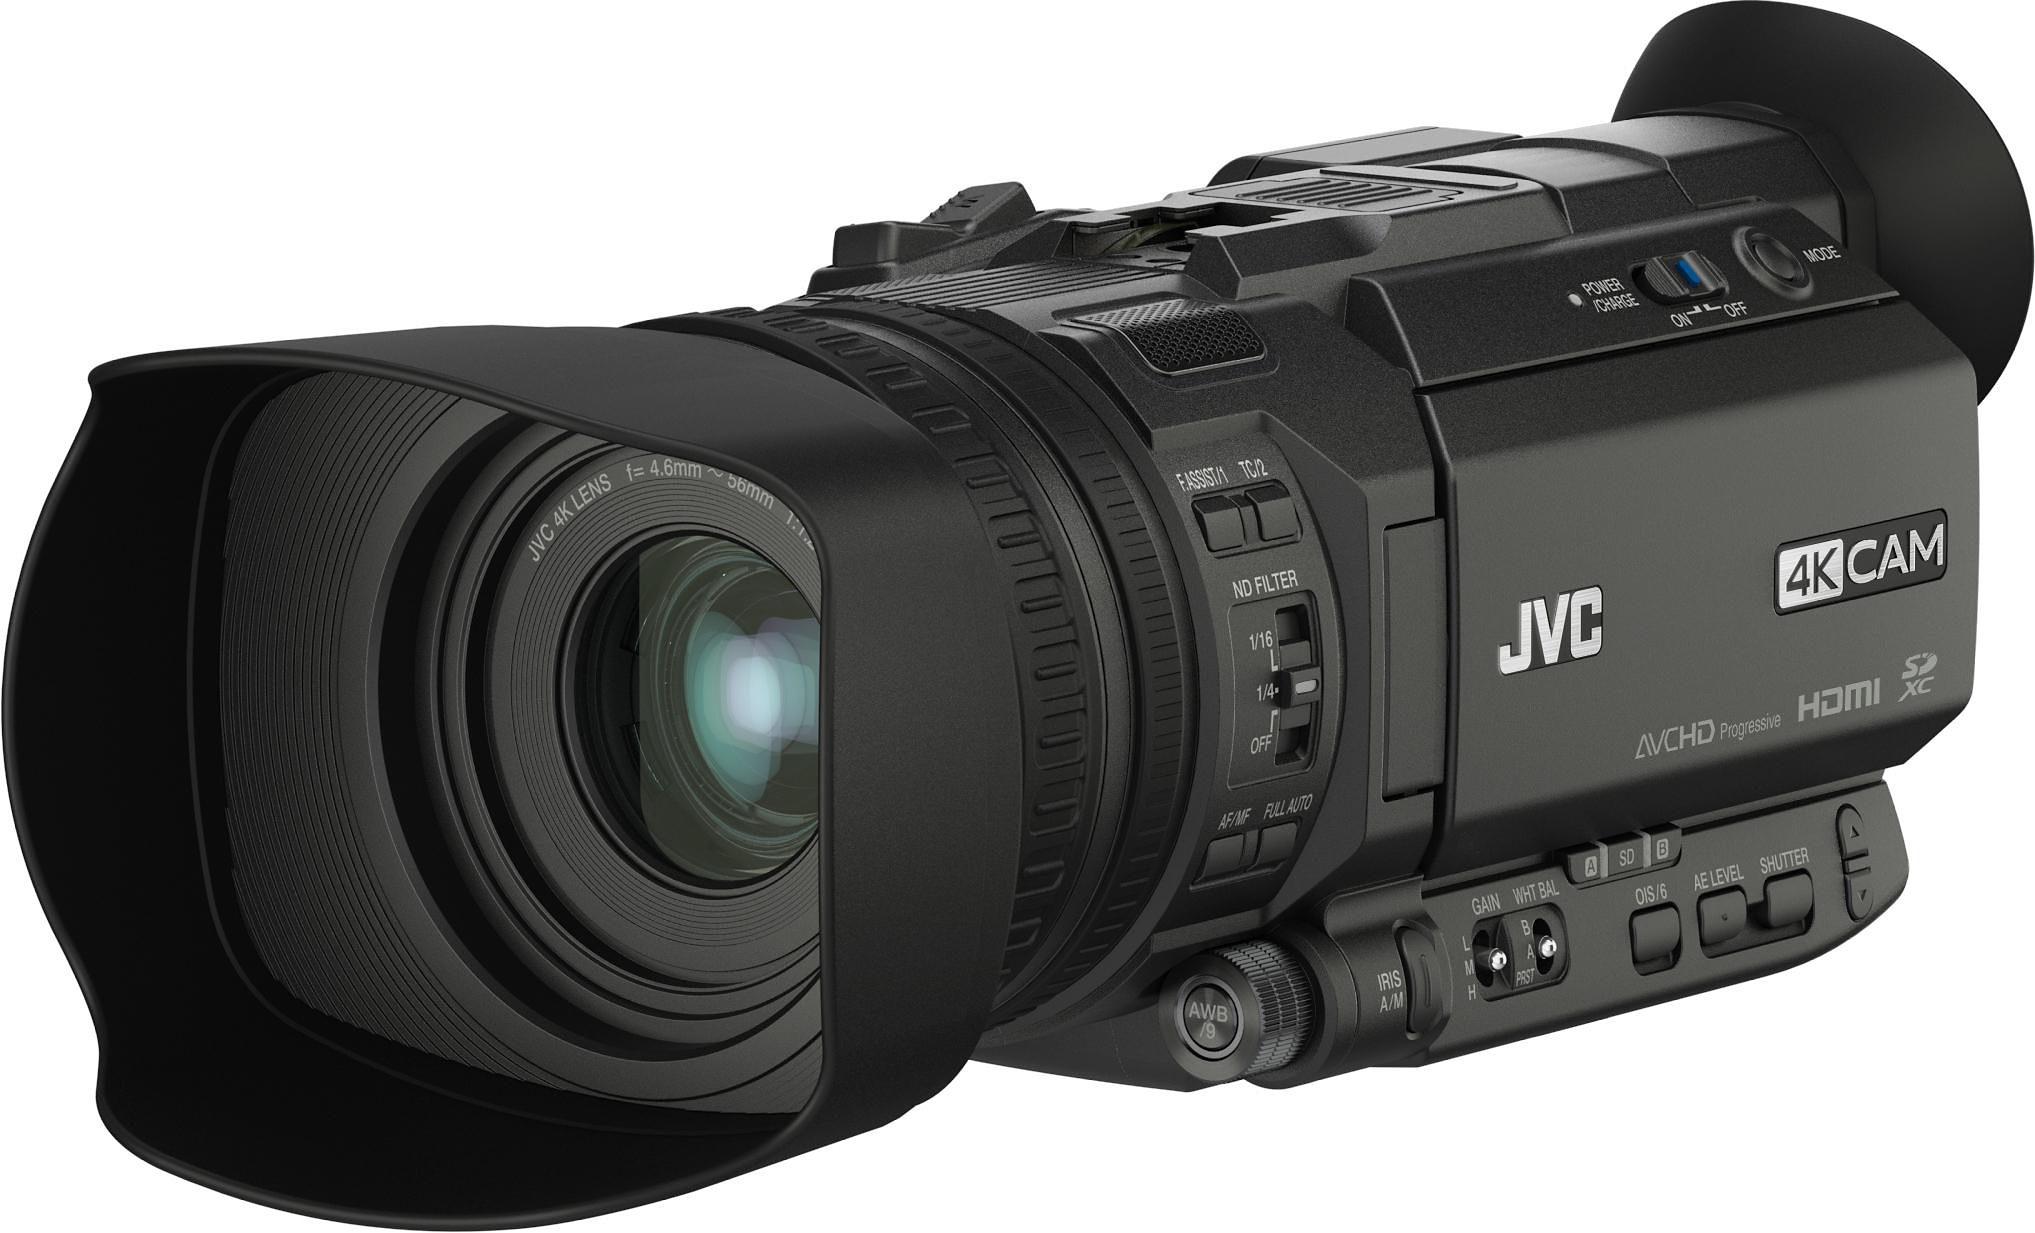 JVC GY-HM170E inkl. Haltegriff (KA-HU1) 4K (Ultra-HD) Camcorder